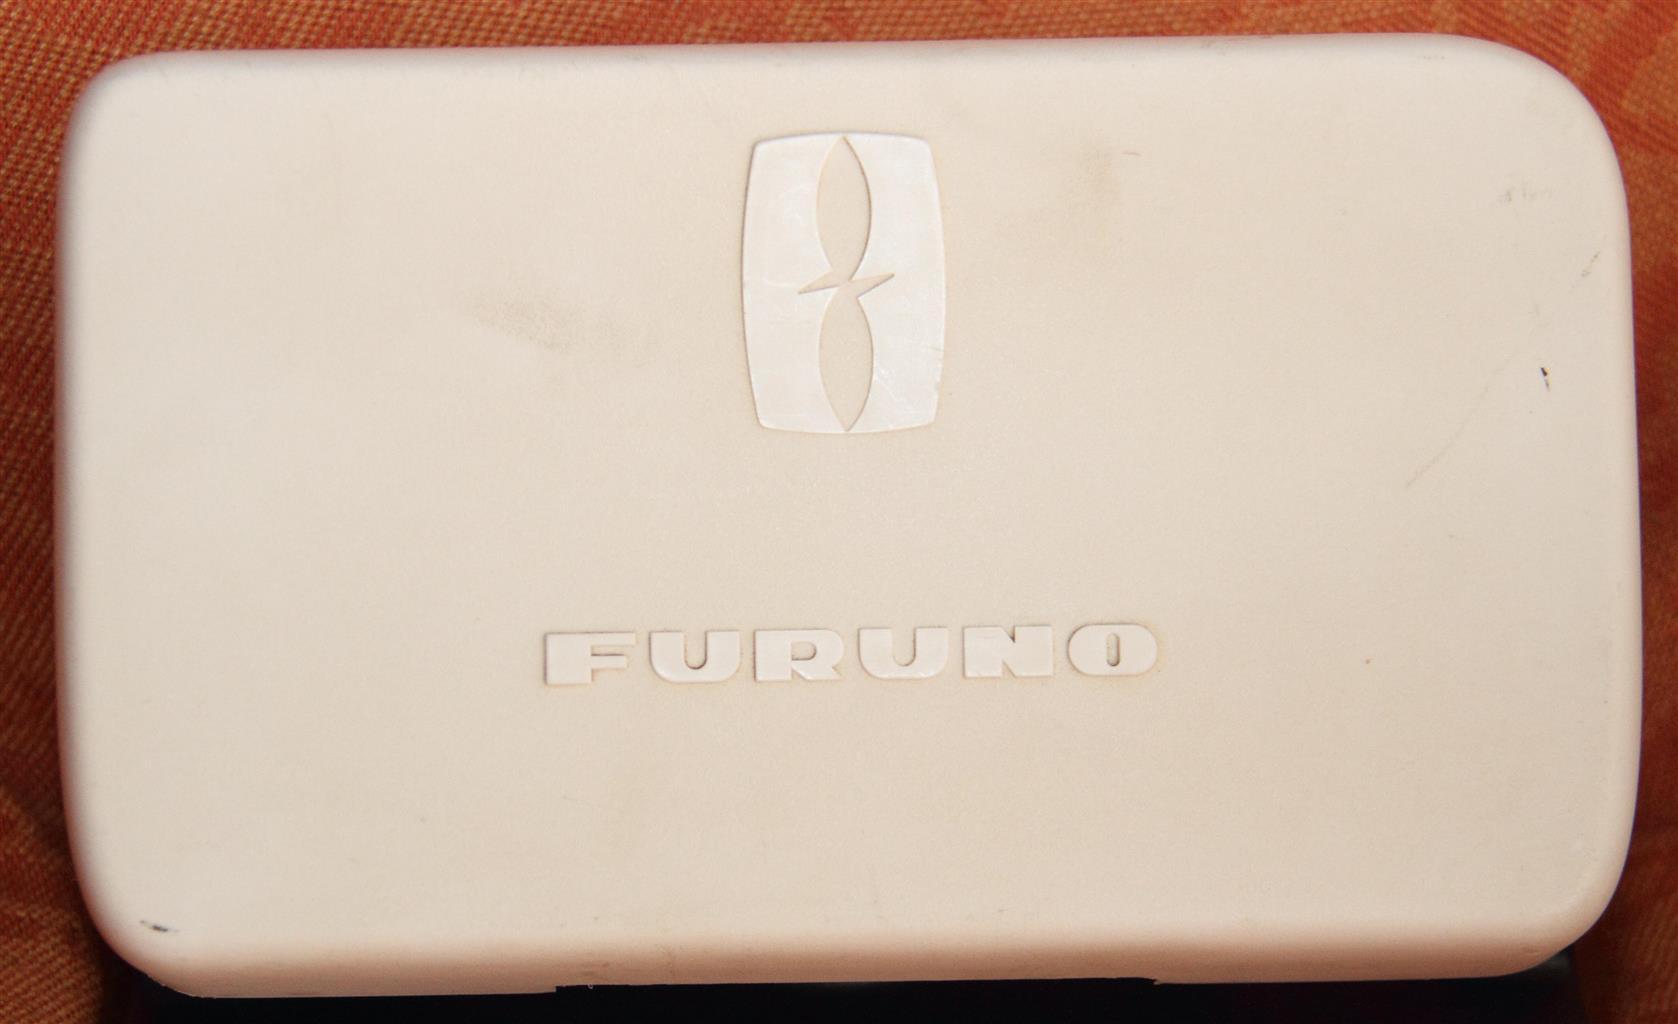 Used Furuno Gps Plotter Sounder Gp1870f With Transducer Tm268 1kw Half Inch Rachet Security Electric Fencing Nemtek South Africa 50 200kh